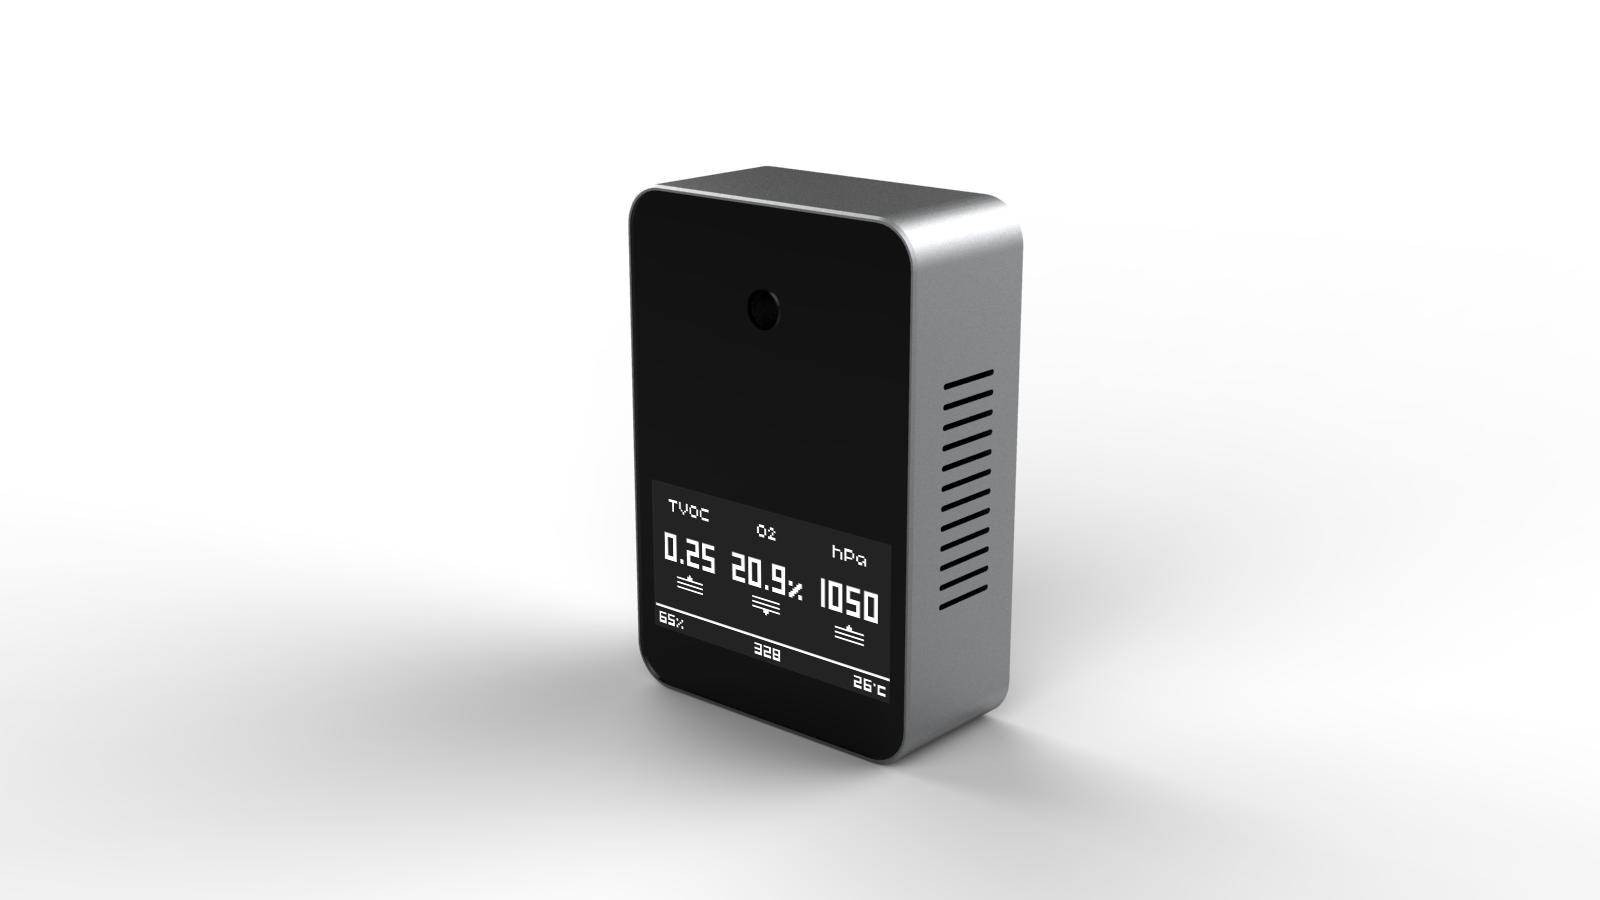 空气质量检测仪2.0(显示).png